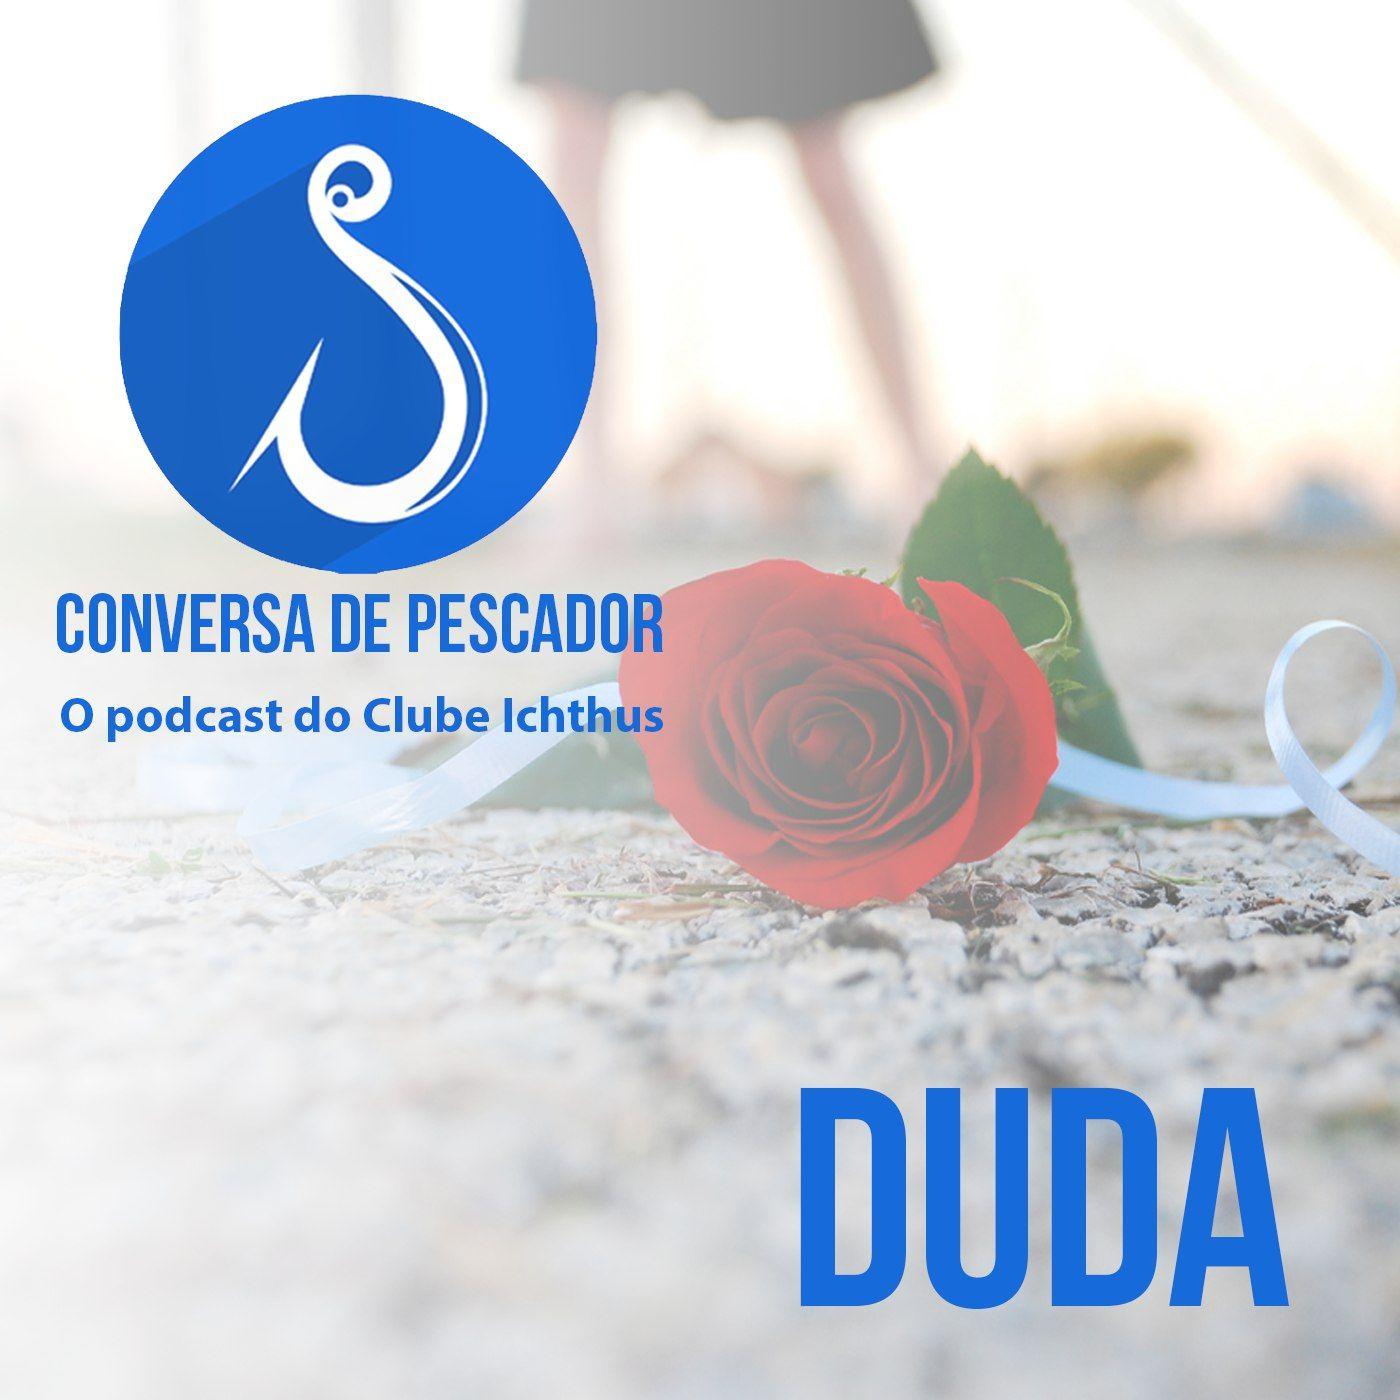 006 - Conversa de pescador - Duda